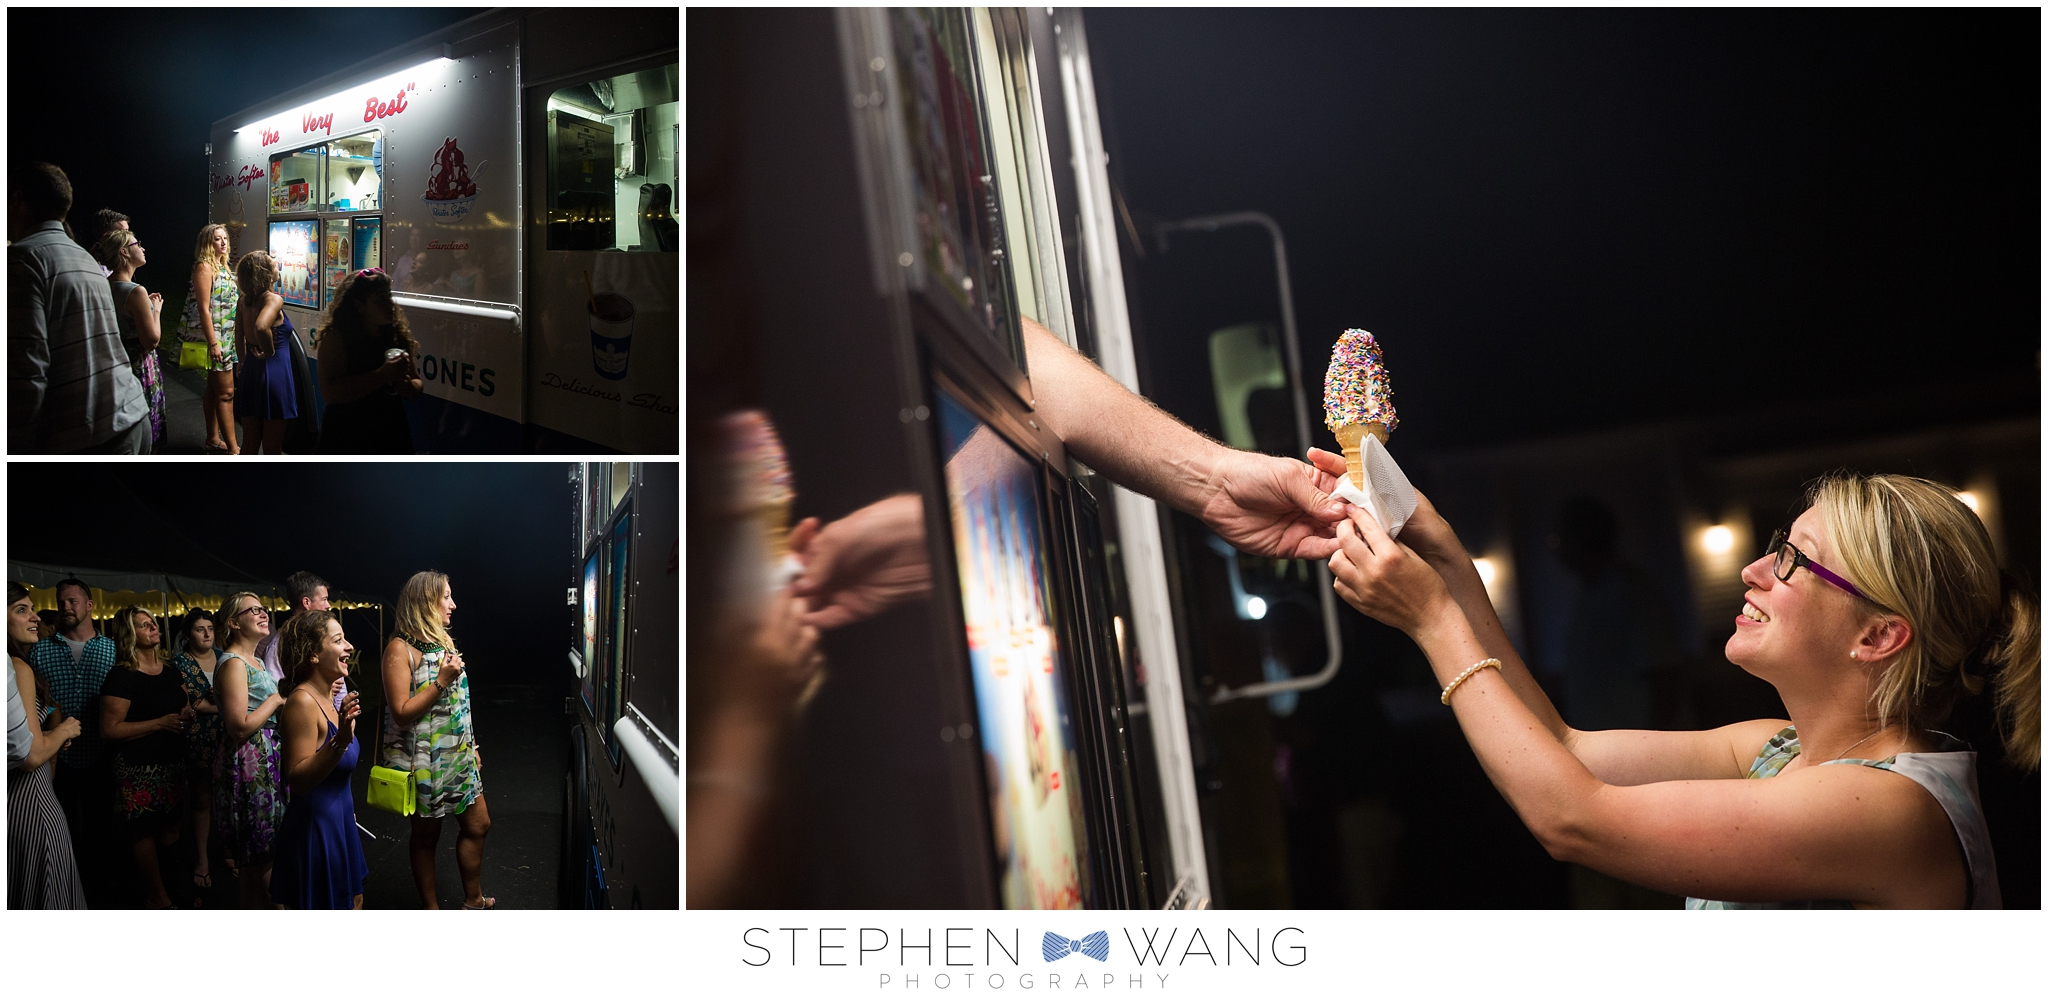 Stephen Wang Photography wedding photographer haddam connecticut wedding connecticut photographer philadlephia photographer pennsylvania wedding photographer bride and groom00040.jpg